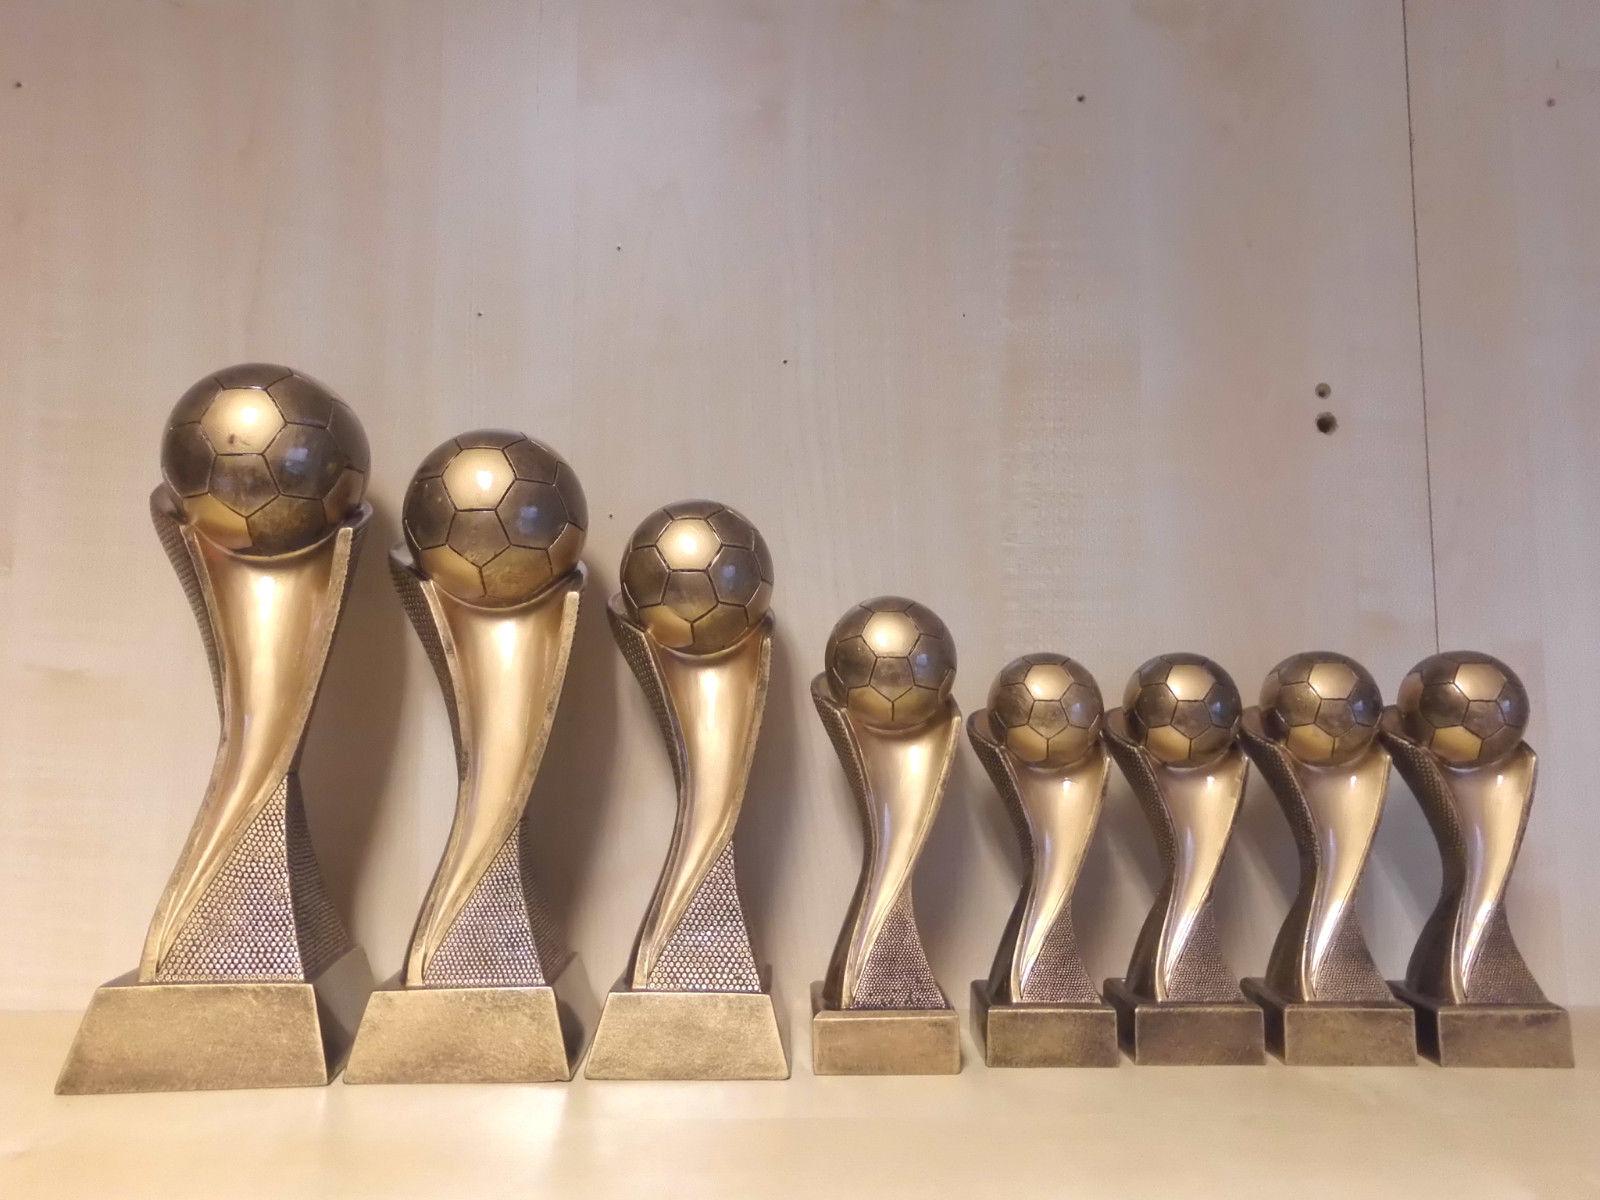 Fußball Pokale 8er Serie (17-30 cm) Kids Figuren Pokal Turnier Turnier Turnier mit Gravur (c156) bb1774